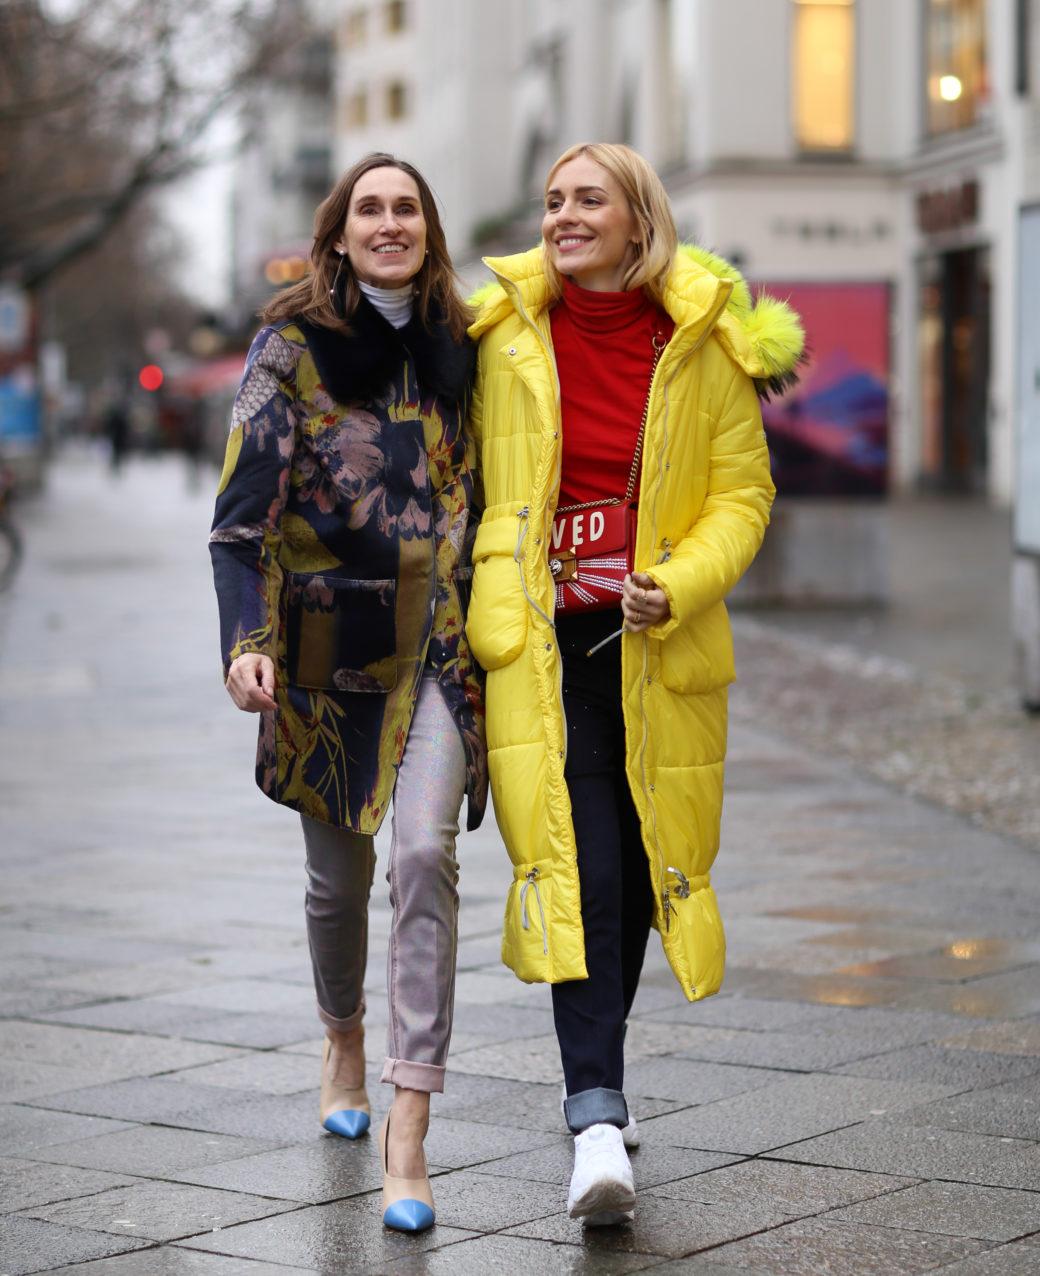 Sieht atemberaubende Schuhe aus Damen Isabel Marant